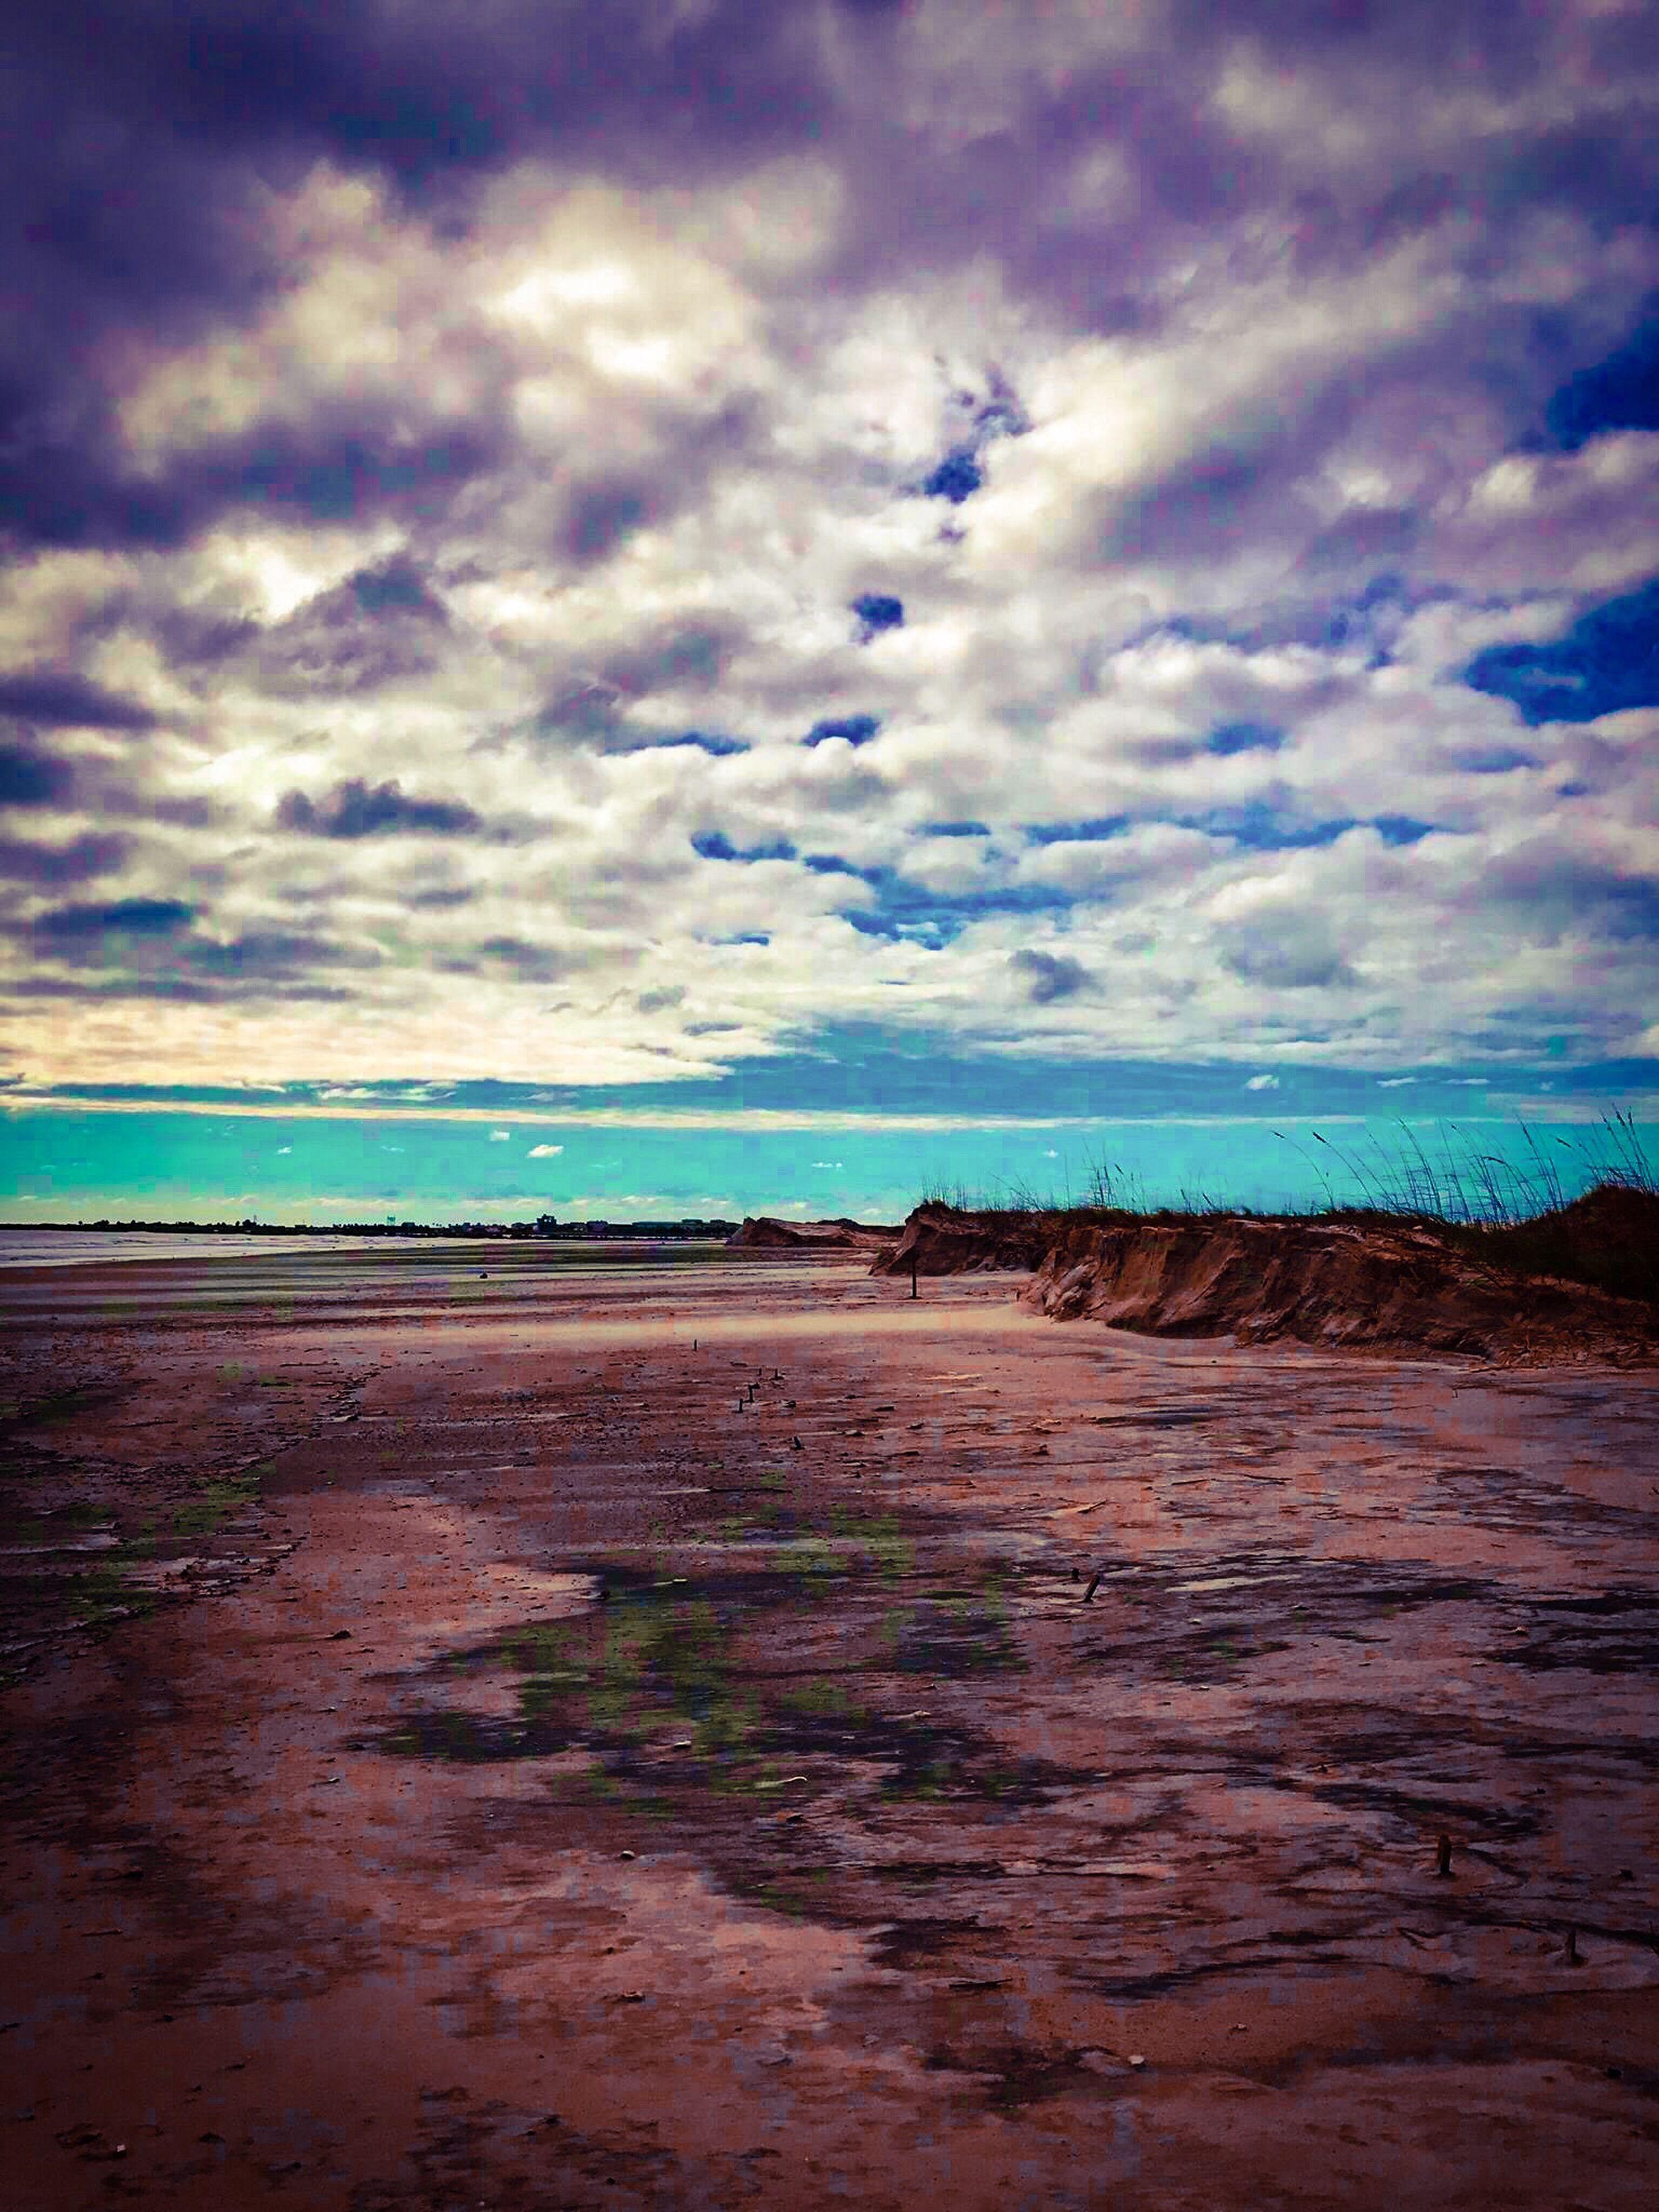 sea, horizon over water, water, beach, tranquil scene, sky, scenics, tranquility, calm, beauty in nature, cloud - sky, shore, blue, cloud, sand, idyllic, nature, coastline, ocean, atmospheric mood, cloudy, majestic, non-urban scene, day, seascape, remote, solitude, coastal feature, outdoors, horizon, dramatic sky, tourism, cloudscape, atmosphere